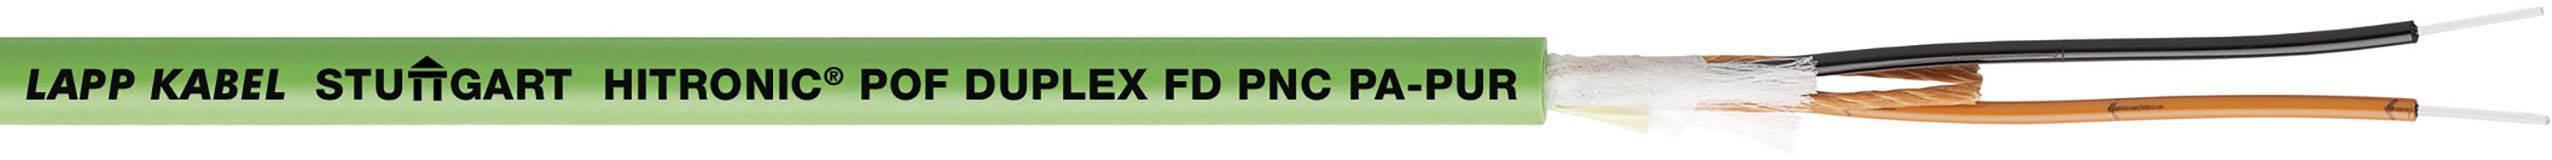 Optický kabel POF LAPP HITRONIC POF DUPLEX FD PNC PA-PUR 28351002/1000, Duplex, zelená, 1000 m